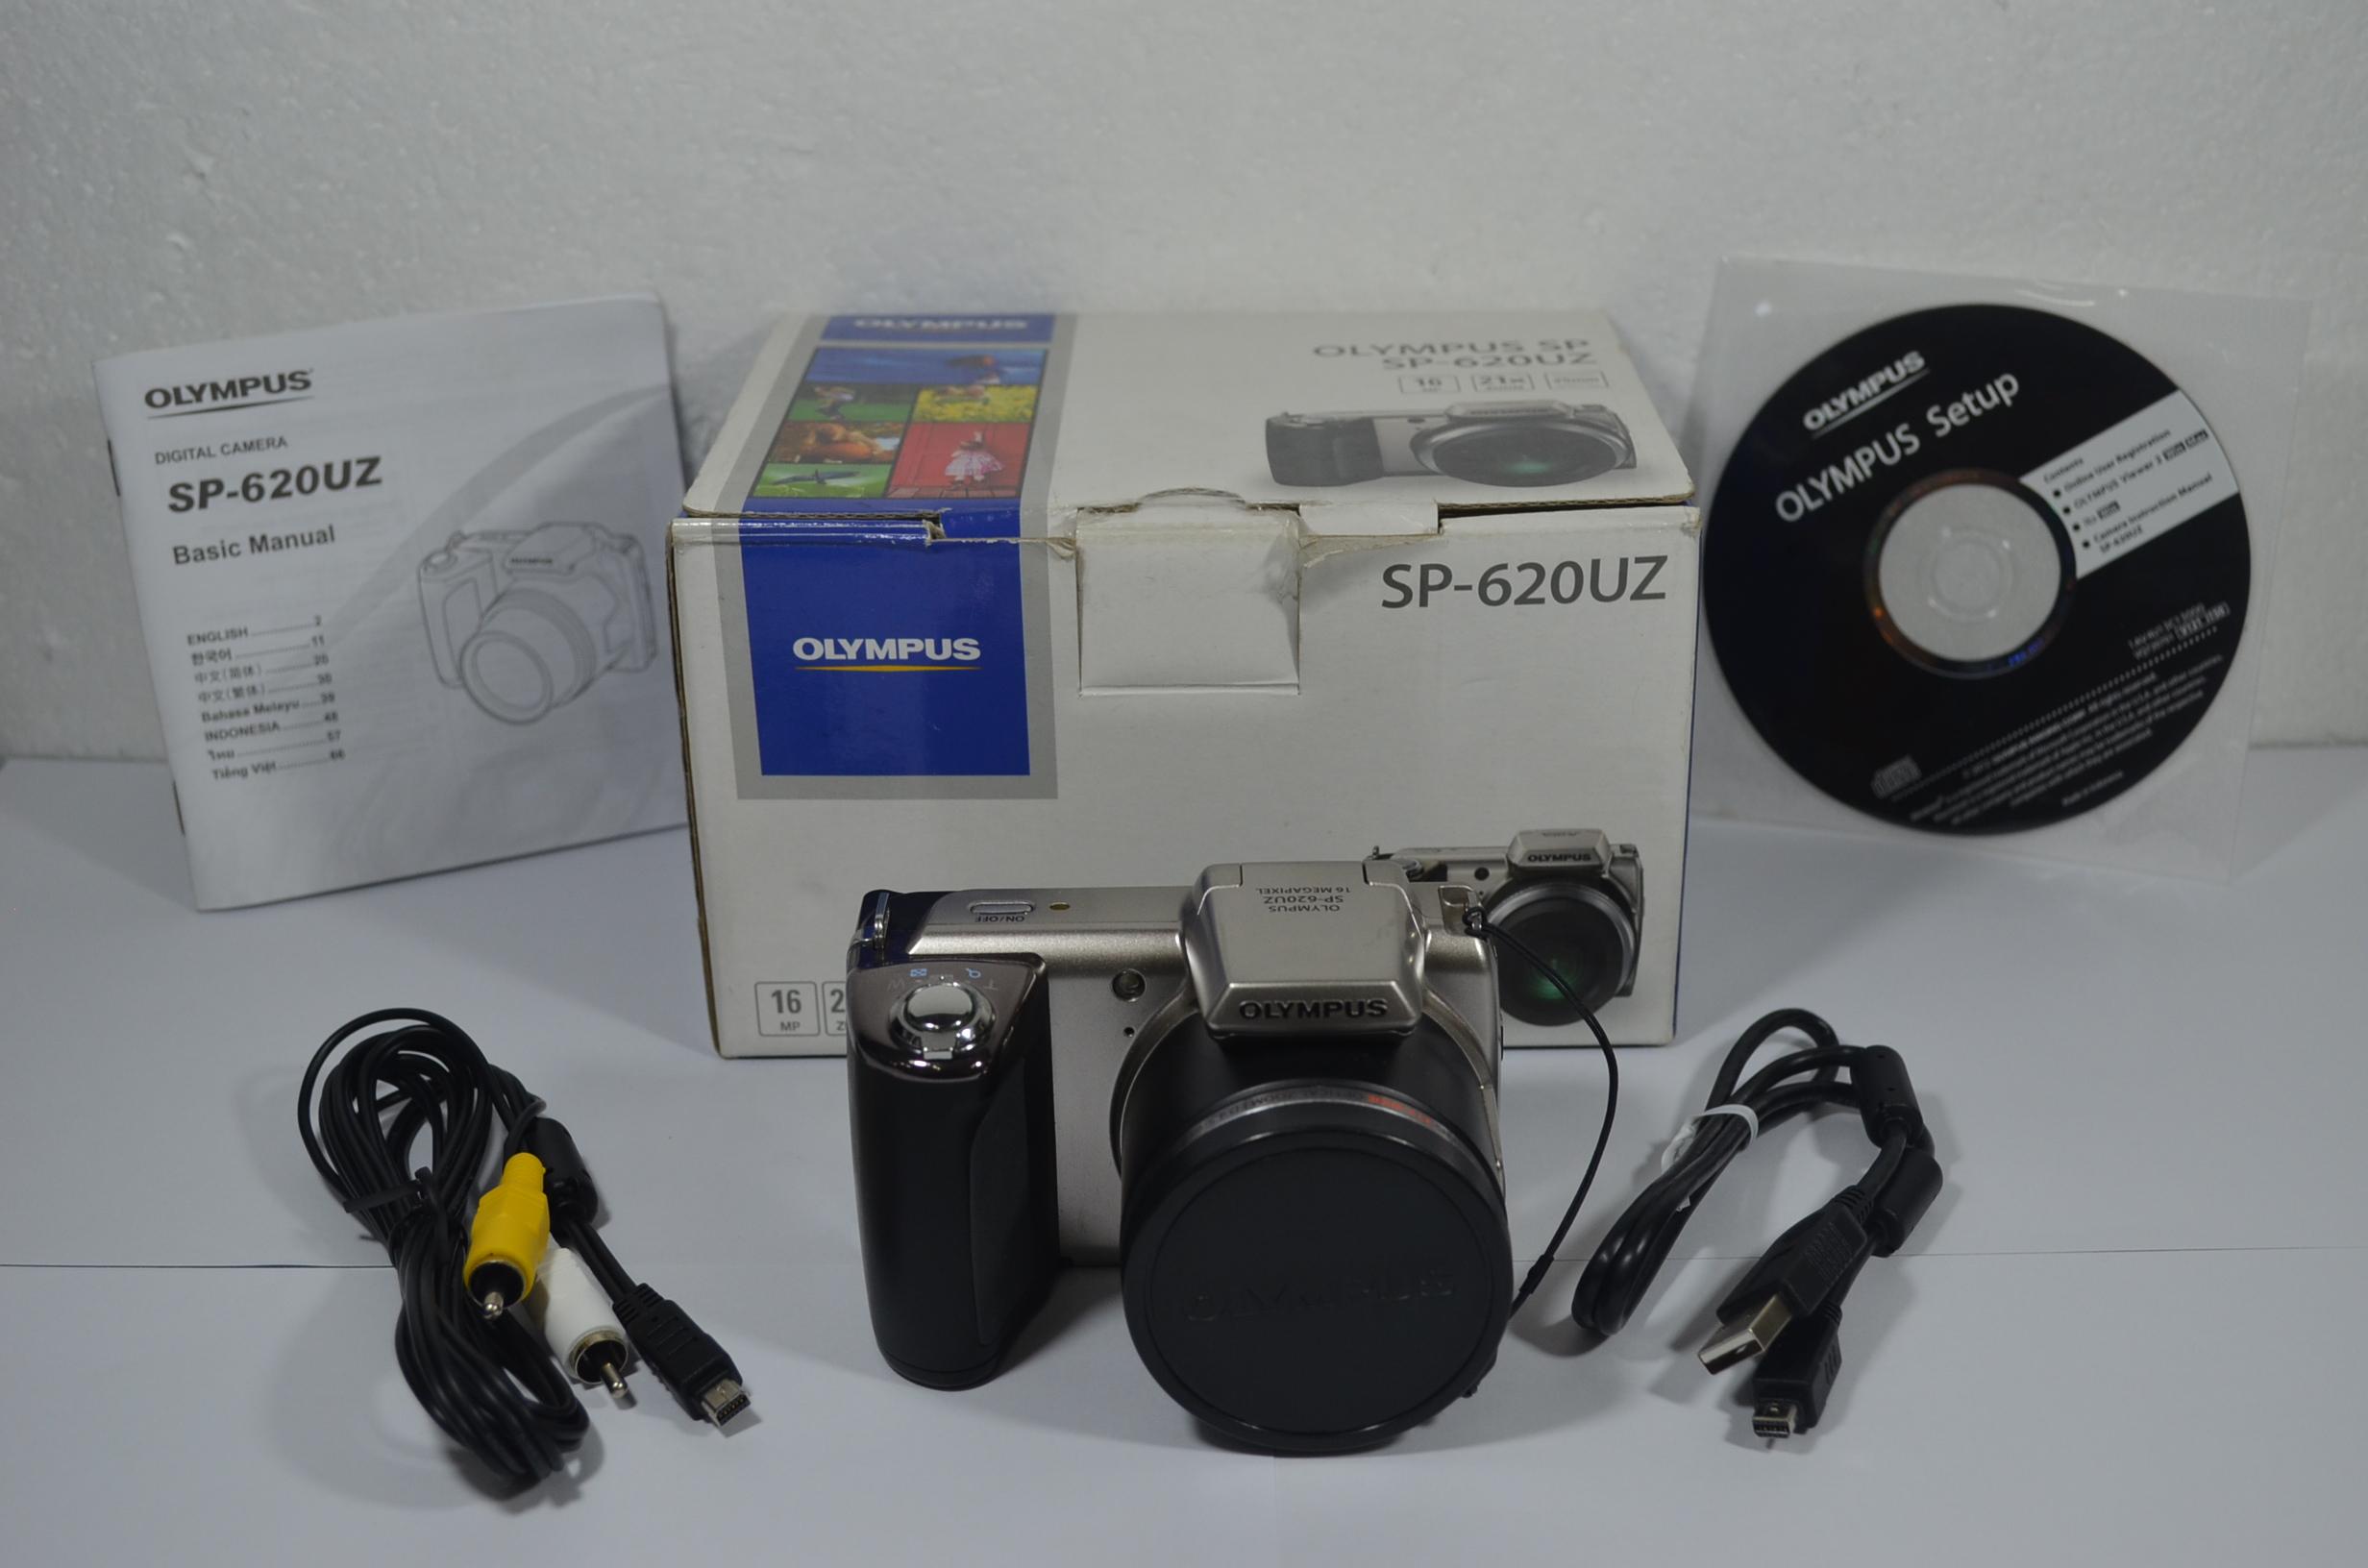 Olympus SP-620UZ 16MP Digital Camera with 21x Optical Zoom